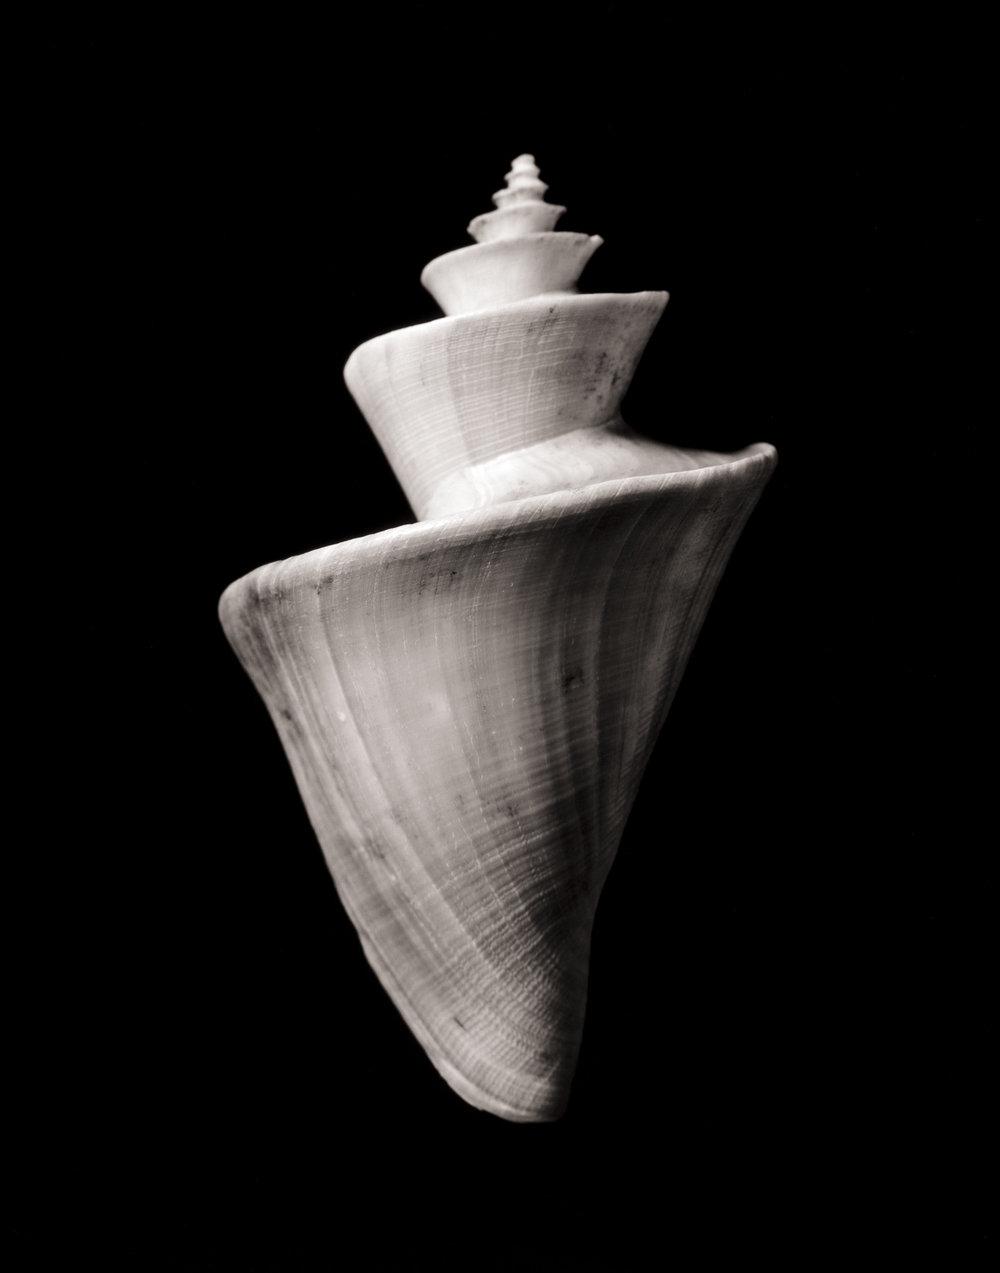 shell2_print12.jpg